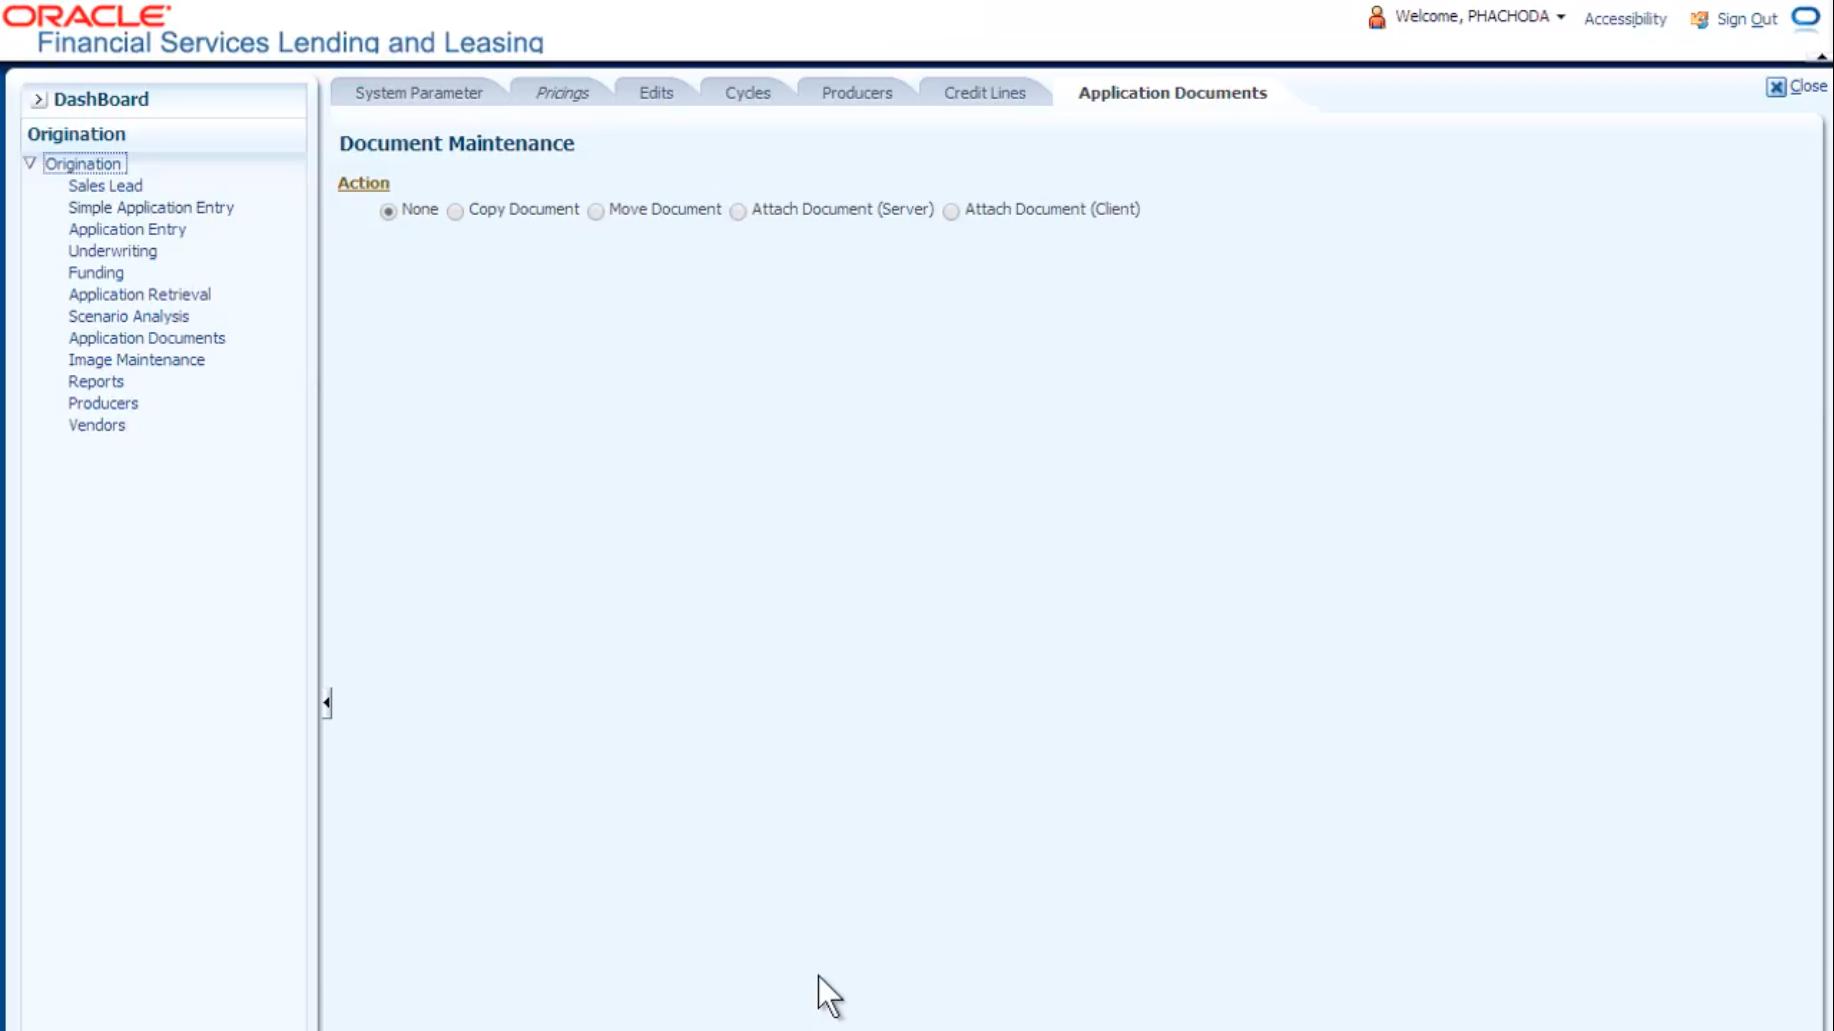 LLaaS Document Management